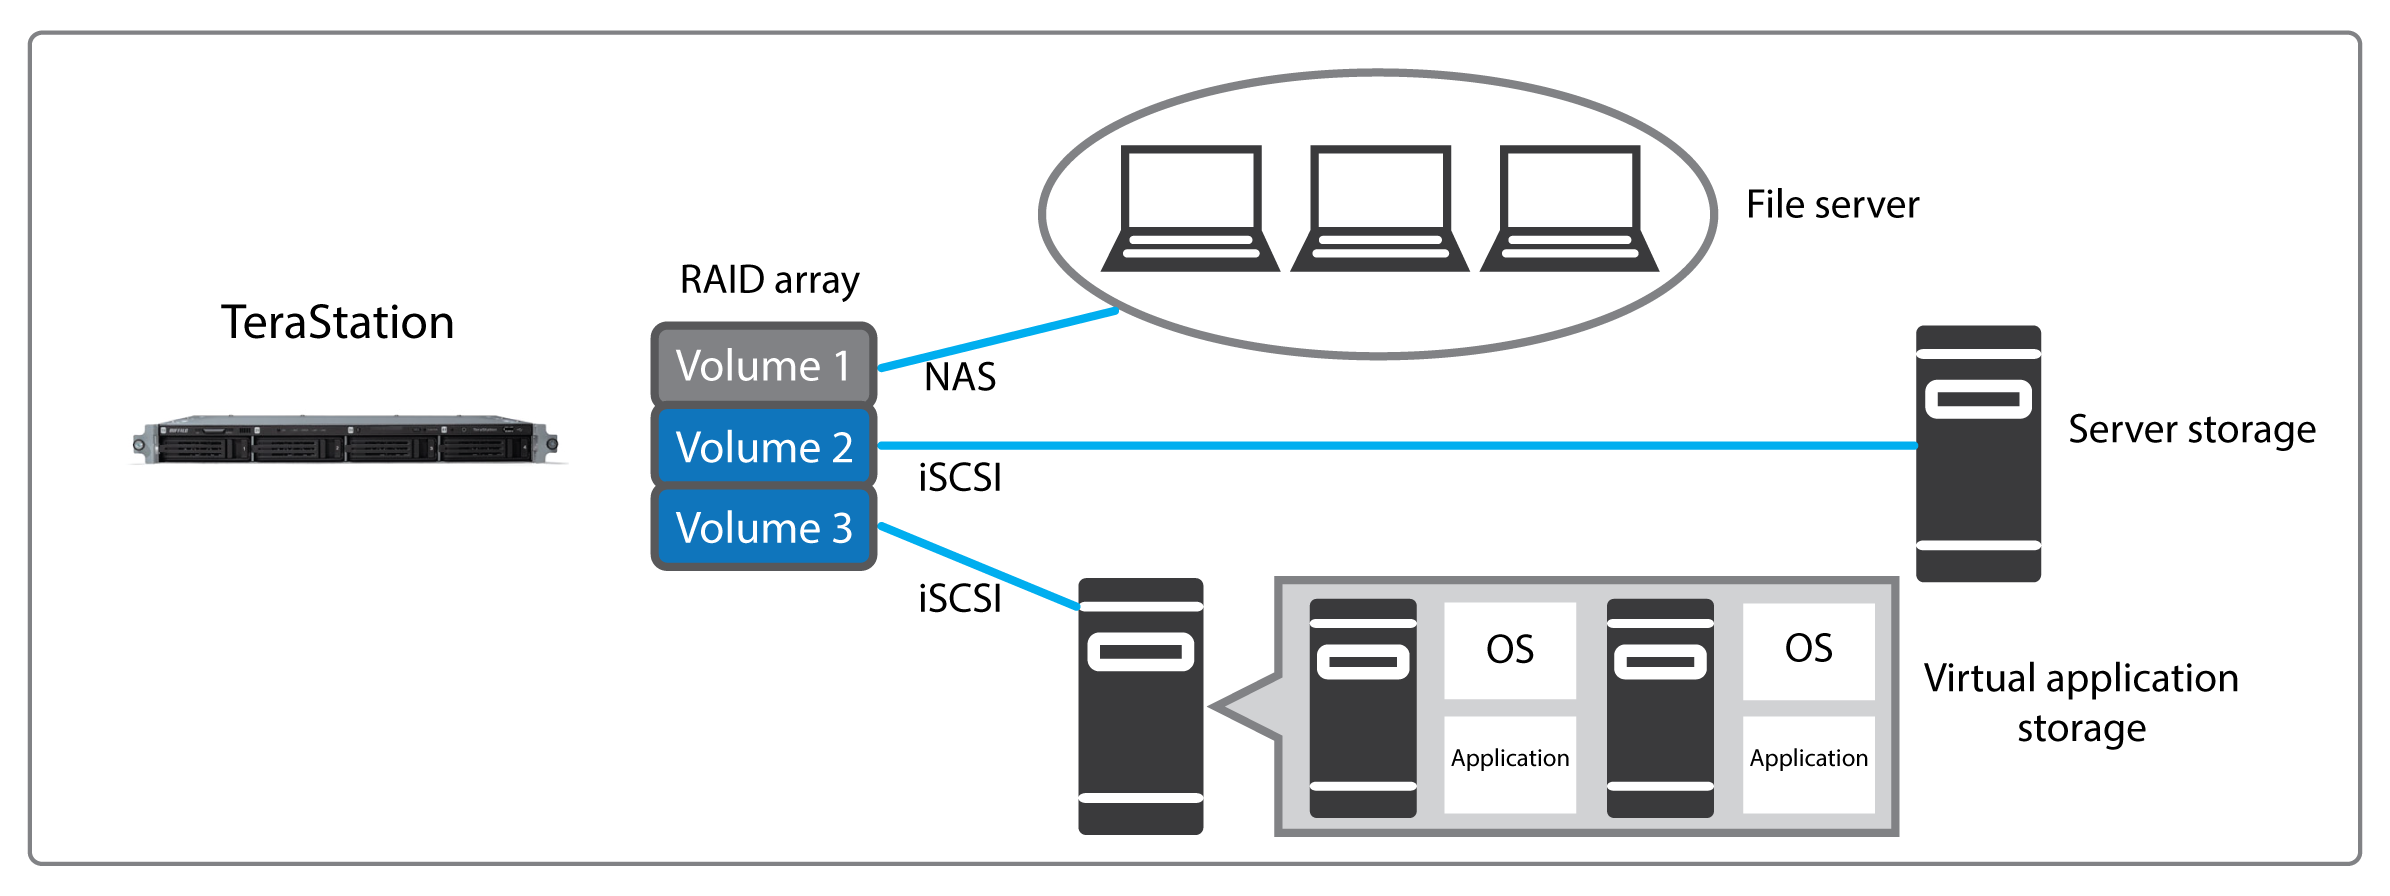 terastation 3000 storage virtualization